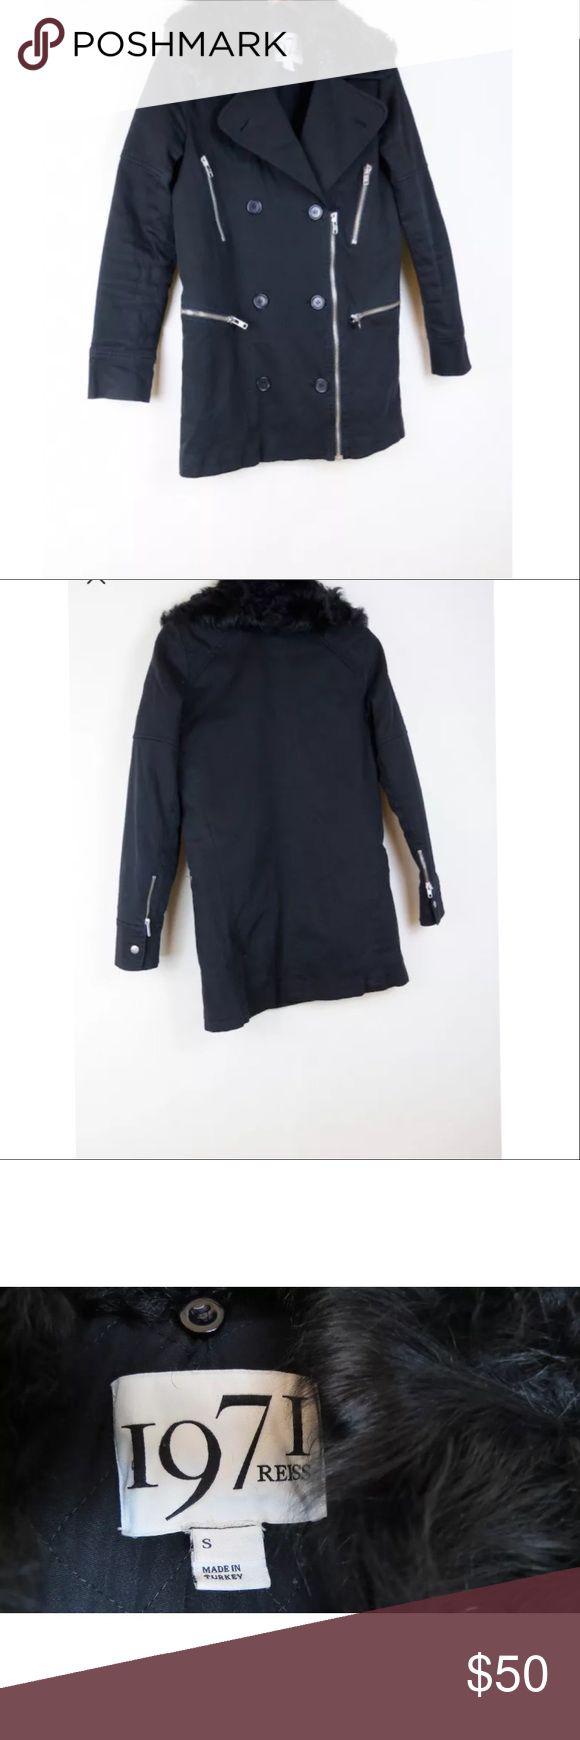 "Reiss 1971 Marleen black lamb fur collar jacket Condition: Good, has a small bald spot on the back of the collar(see photo). 98% cotton, 2% elastan. 28.5"" length, 36"" bust, 36"" waist, 38"" hip, 24"" sleeve length. Reiss Jackets & Coats"